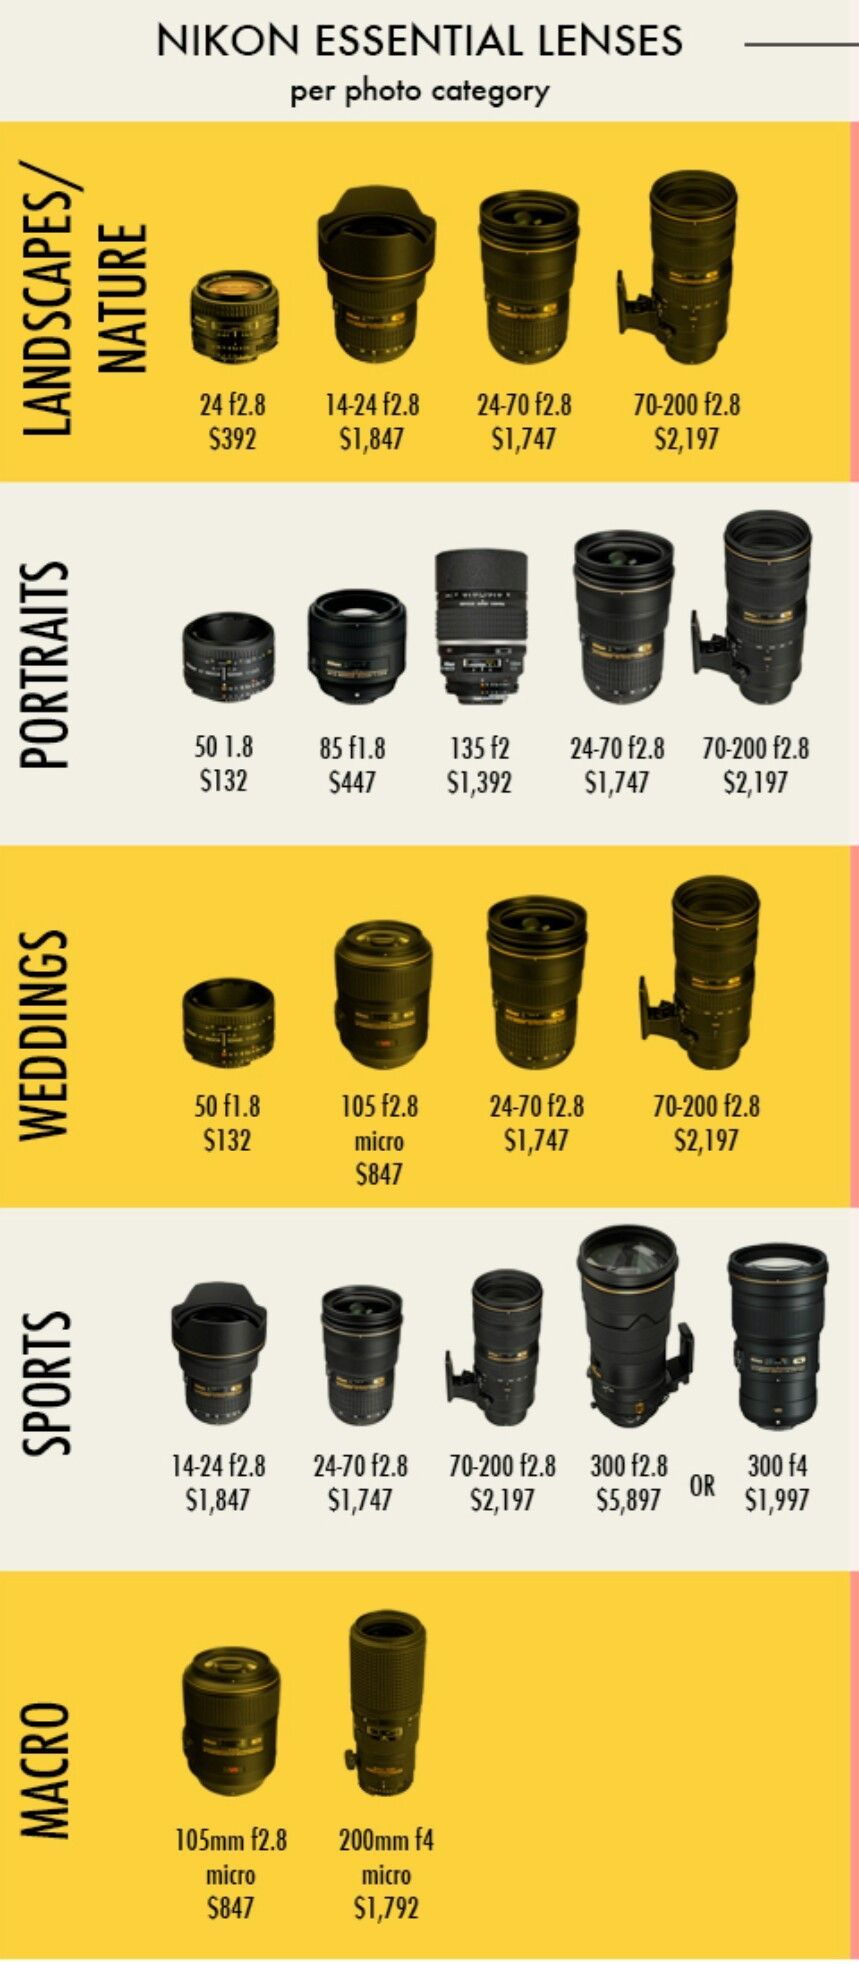 Nikon Essential Lenses #photographytricks | Photography